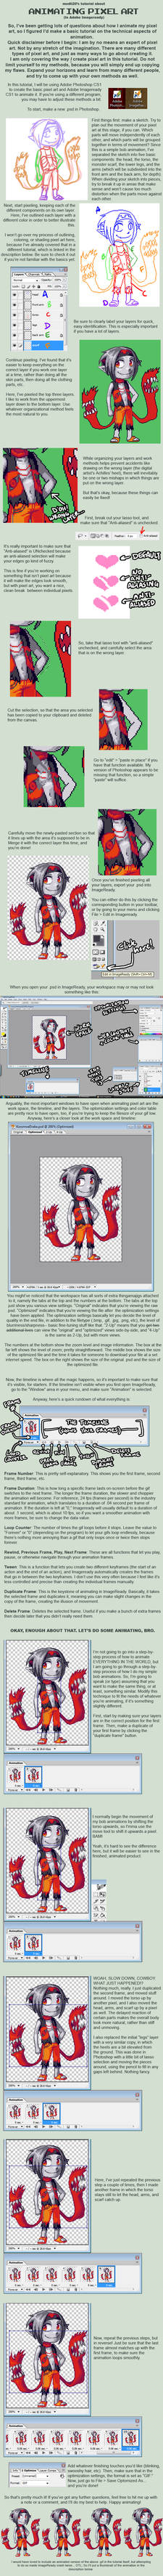 Pixel art tutorial: Animation